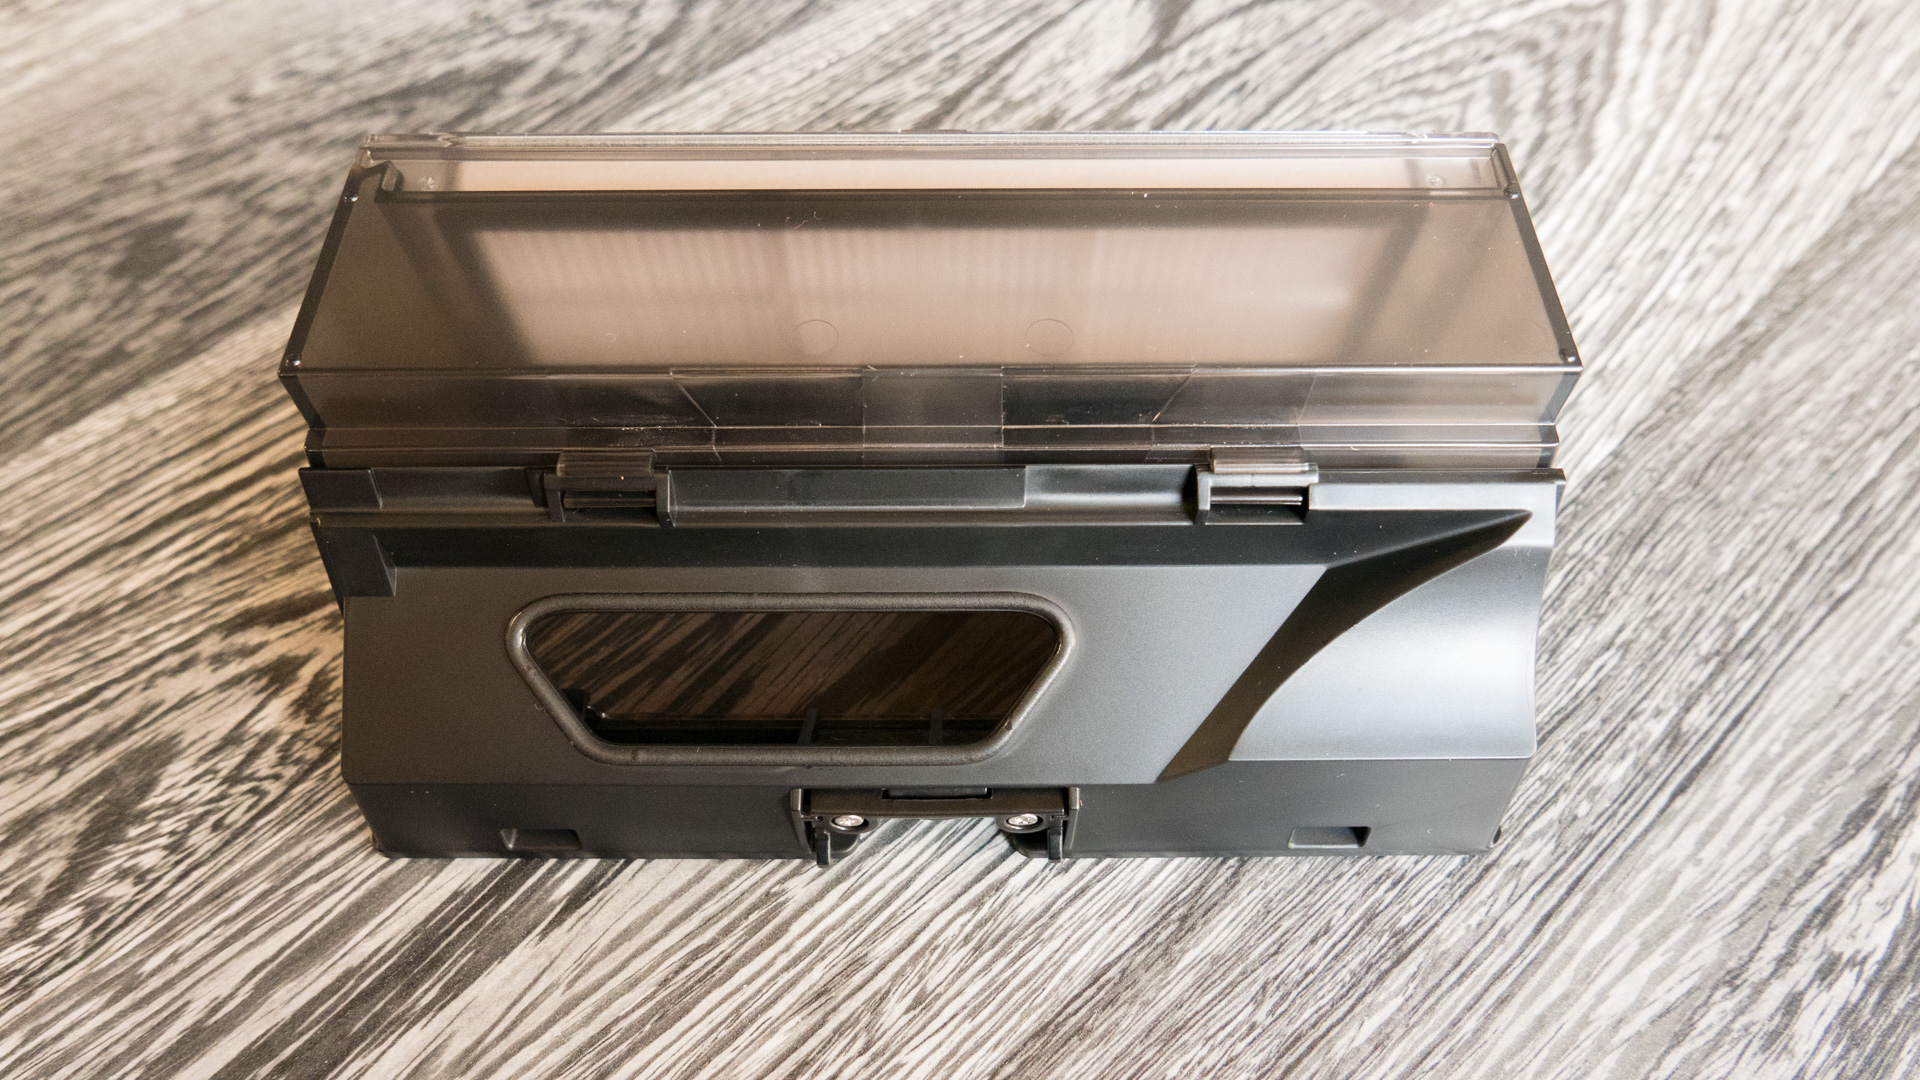 Xiaomi-roborock-S55-Staubbehälter-4